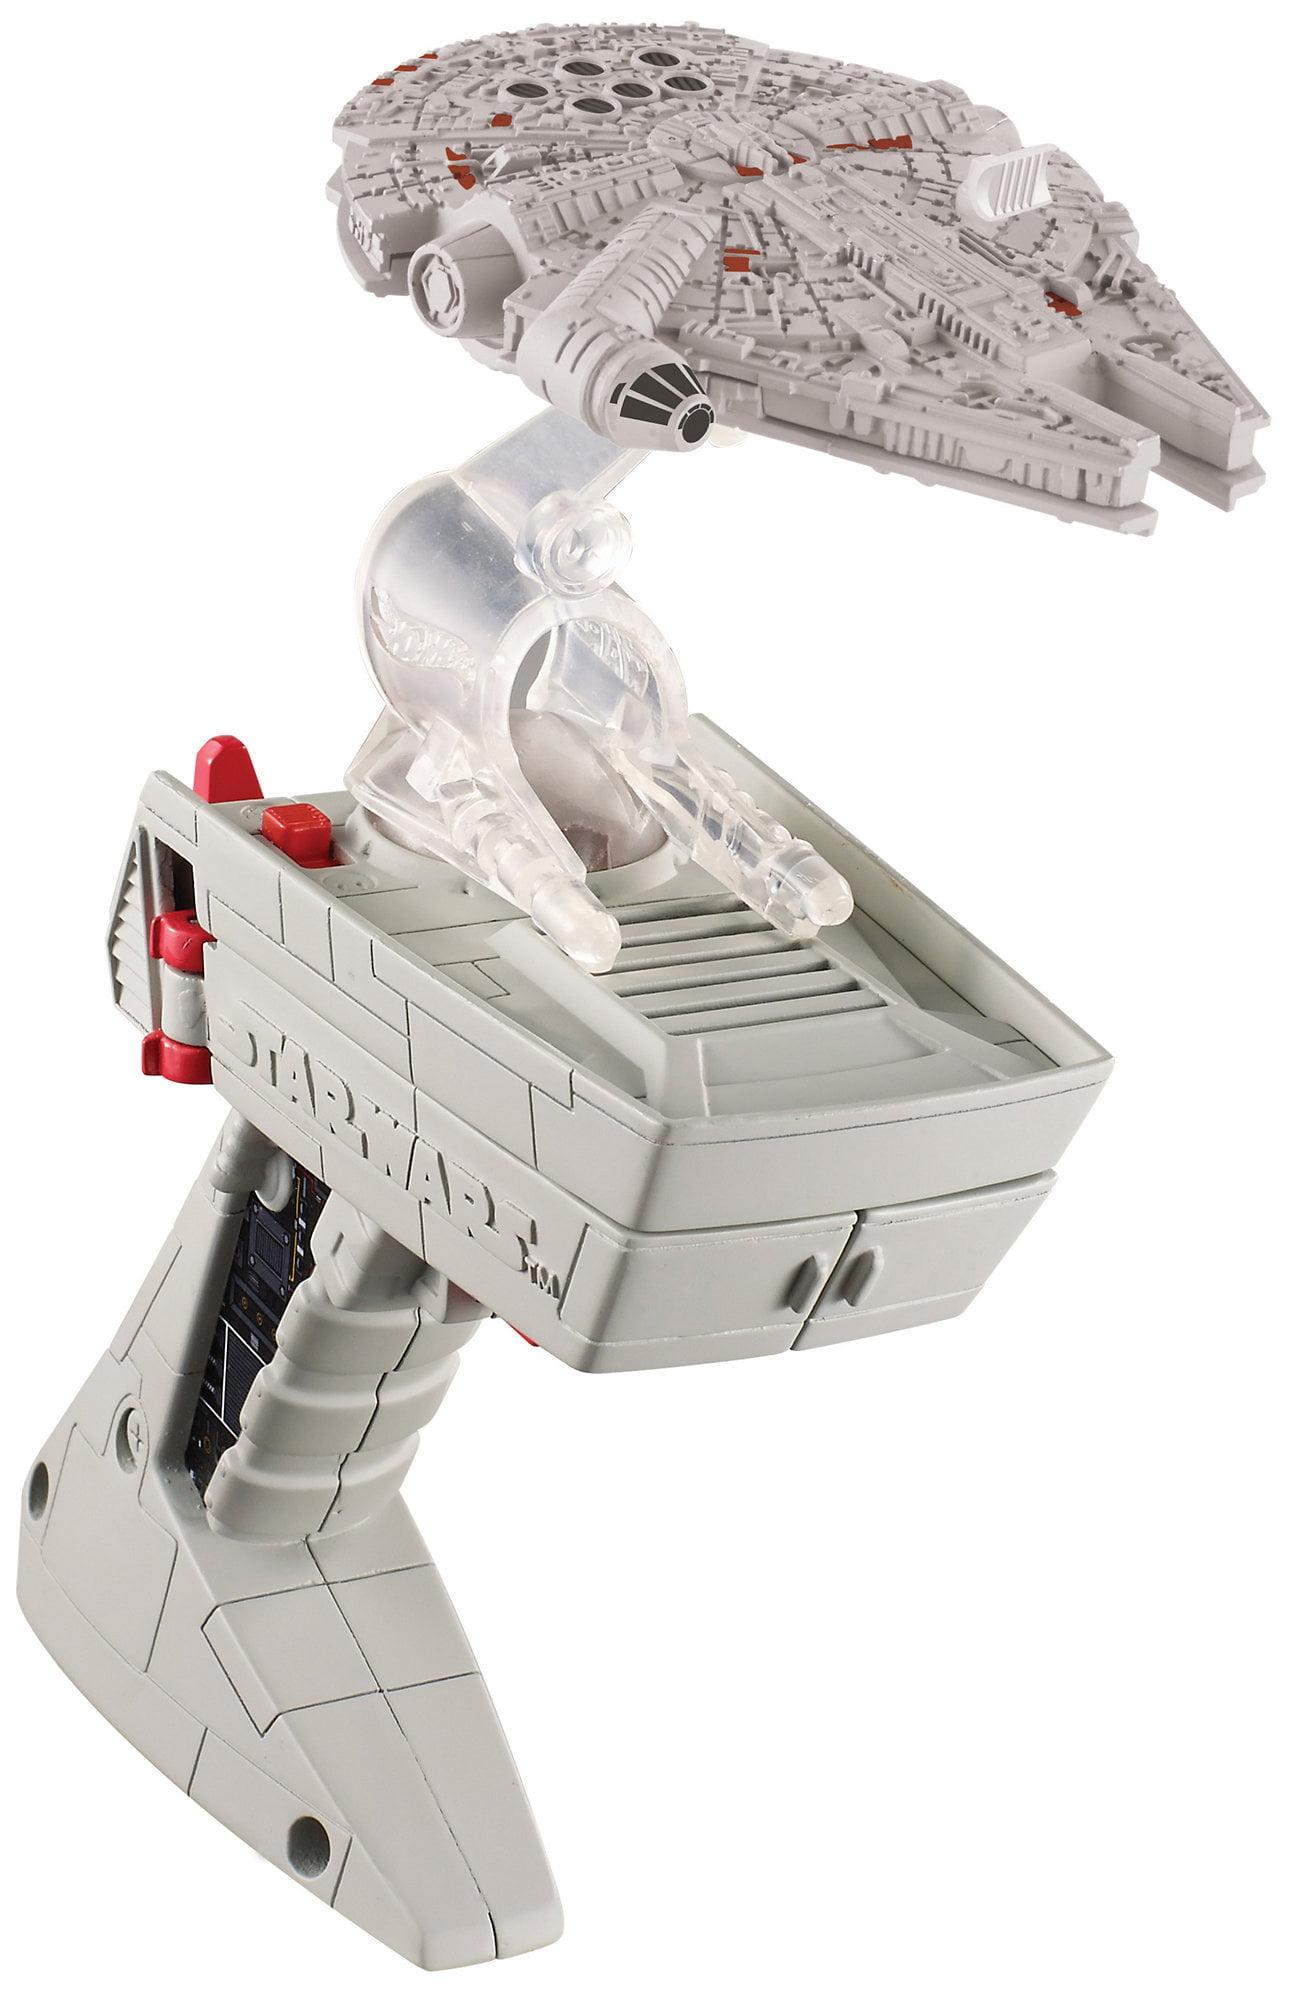 Hot Wheels Star Wars Flight Controller by Mattel